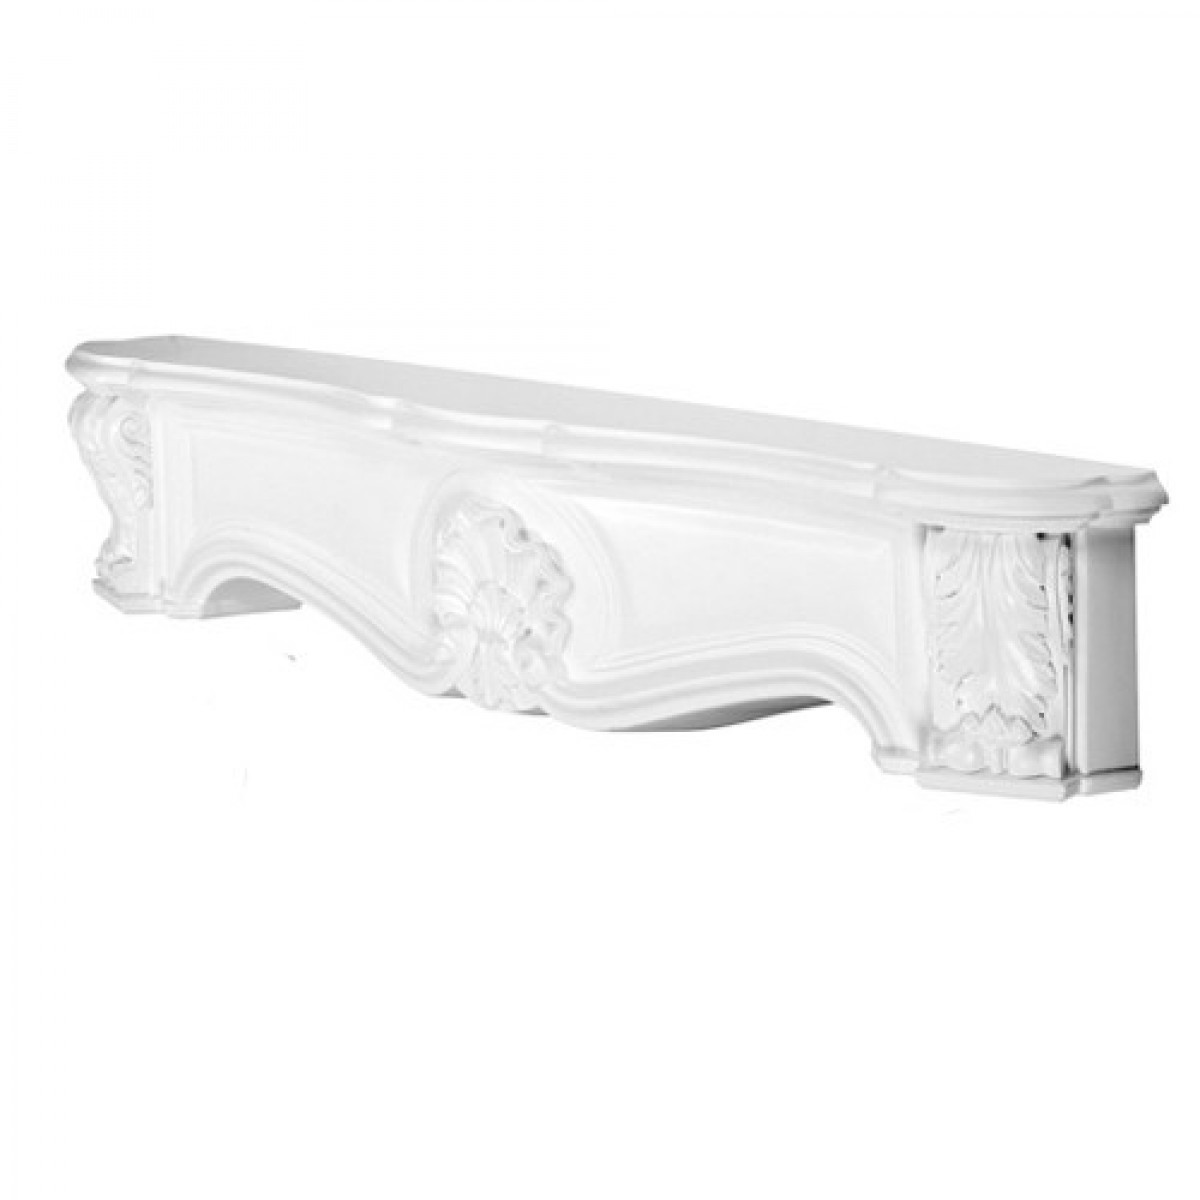 Semineu Decorativ Luxxus H100A, Dimensiuni: 129 X 30.5 X 21 cm, Orac Decor